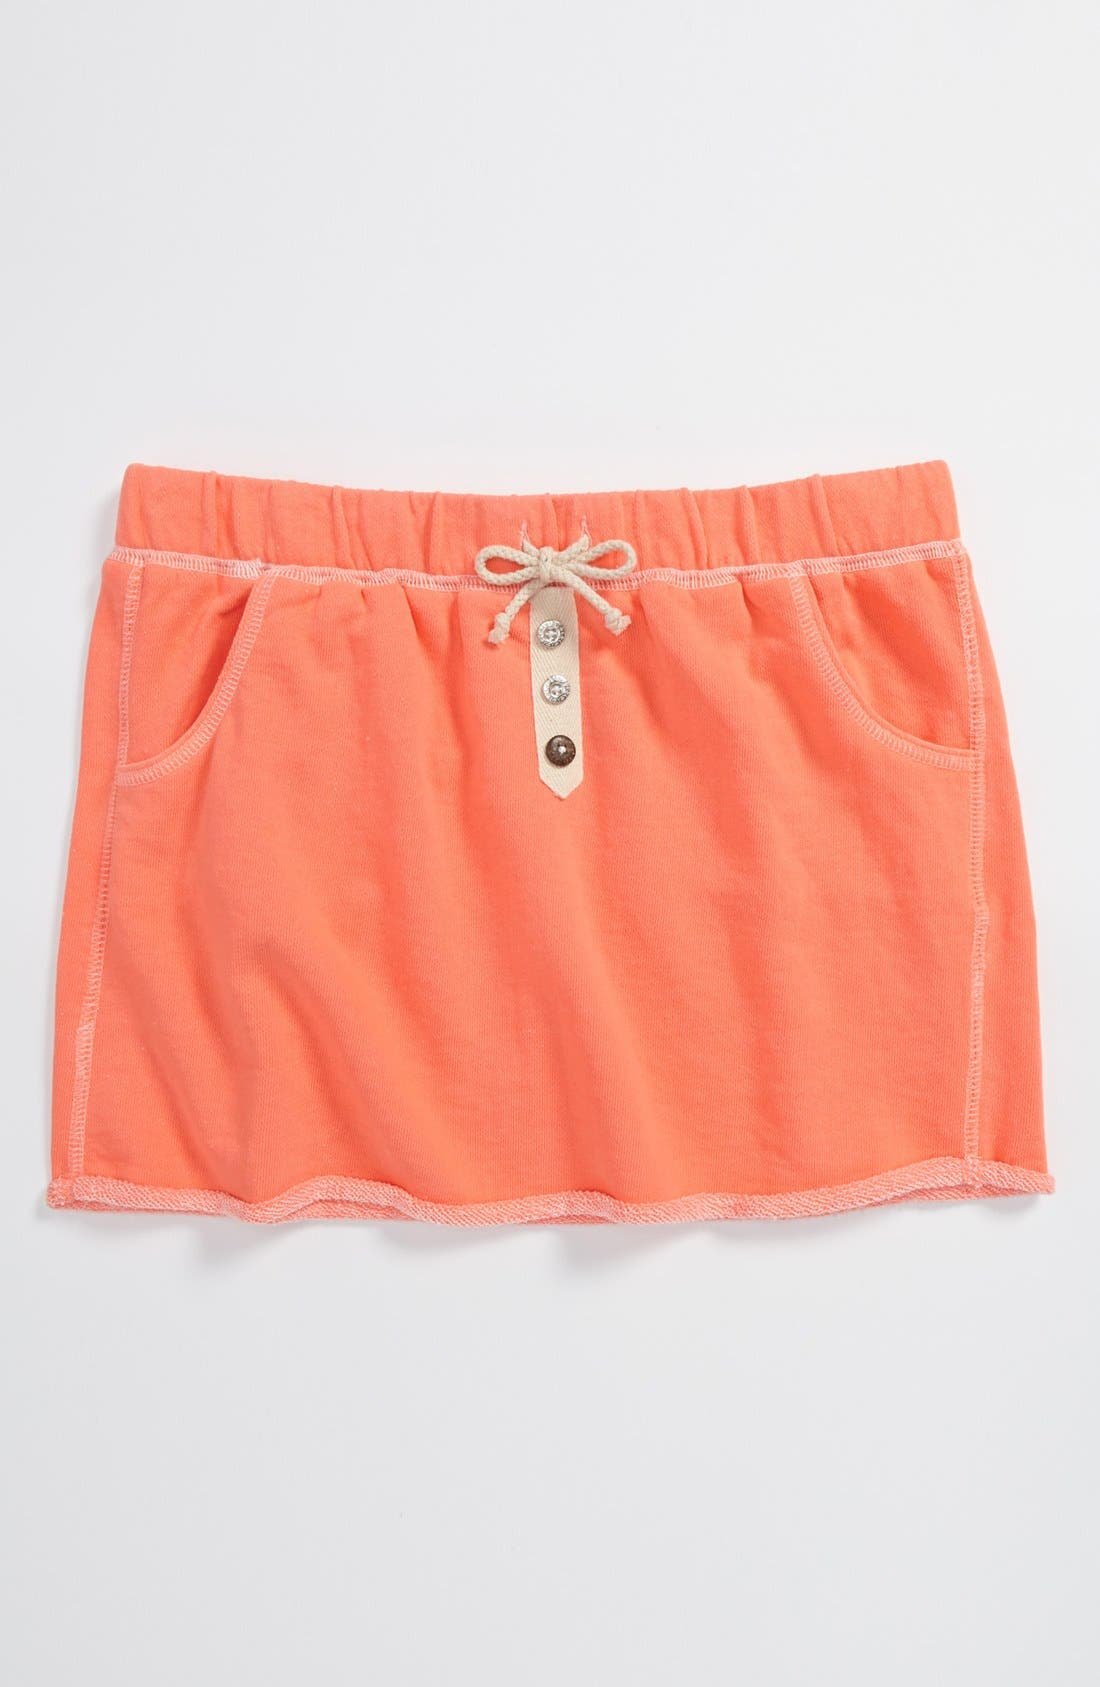 Alternate Image 1 Selected - Tucker + Tate 'Bali' Skirt (Big Girls)